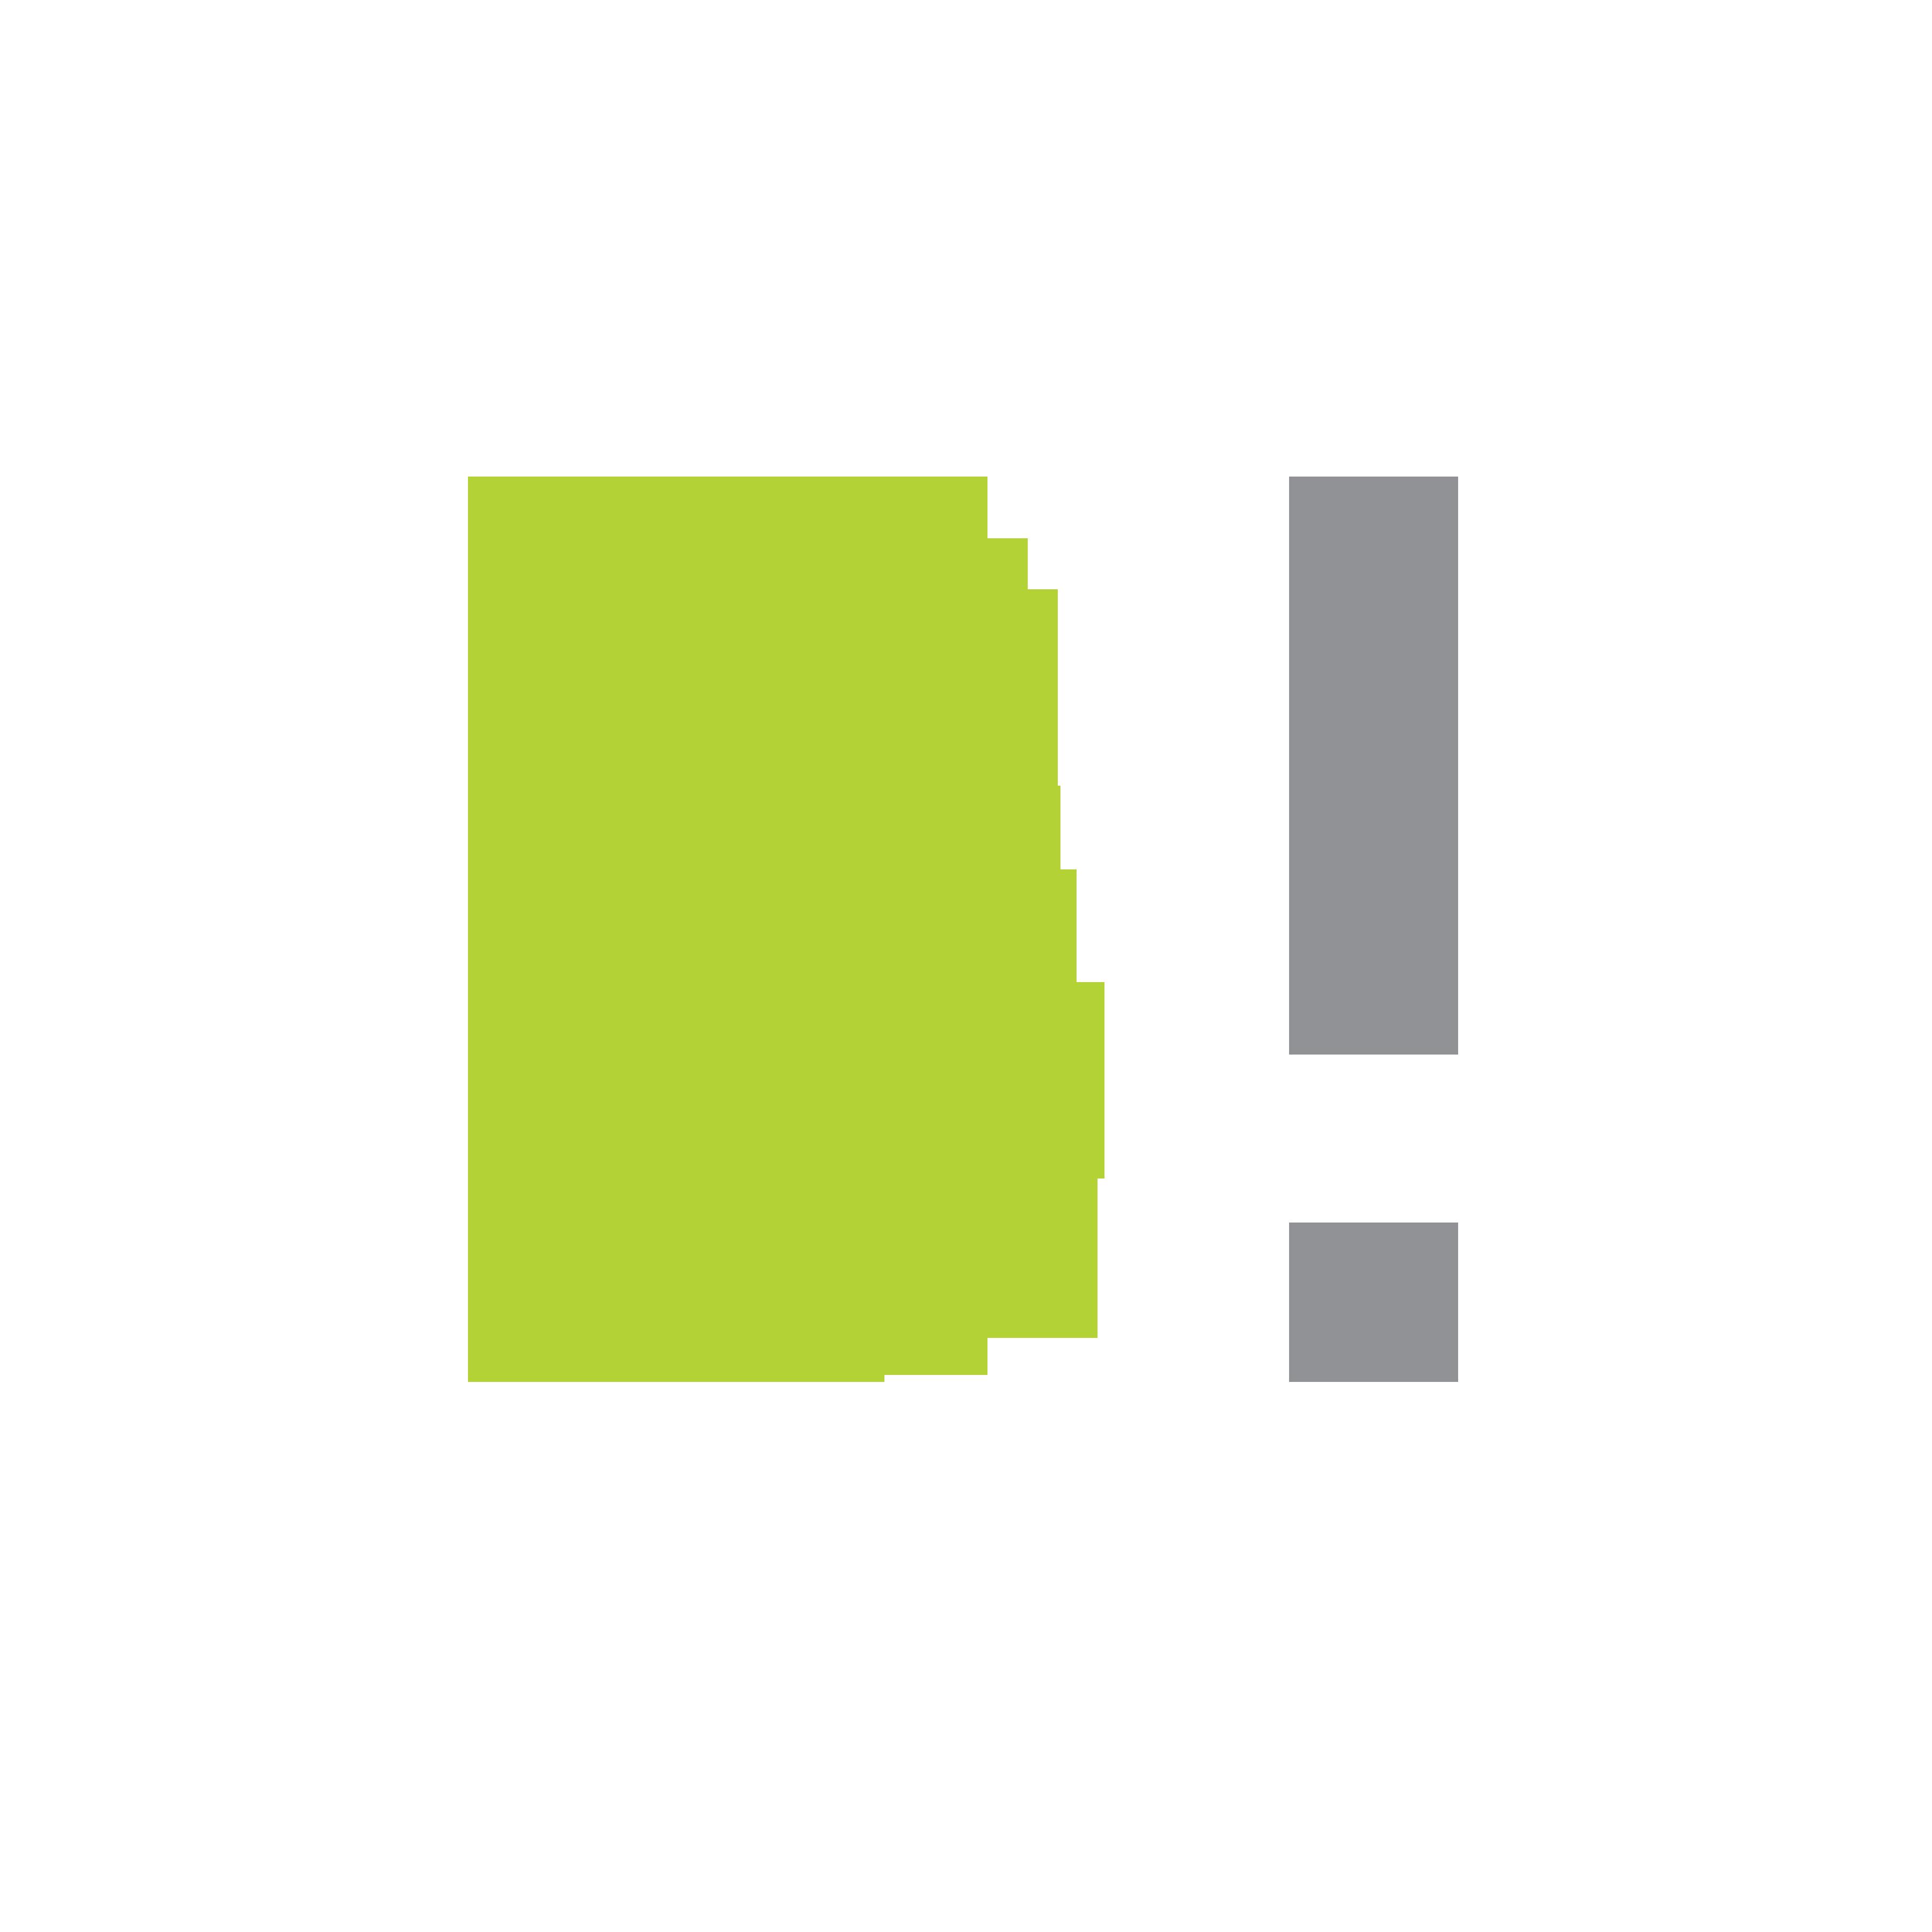 B_icon_12x12